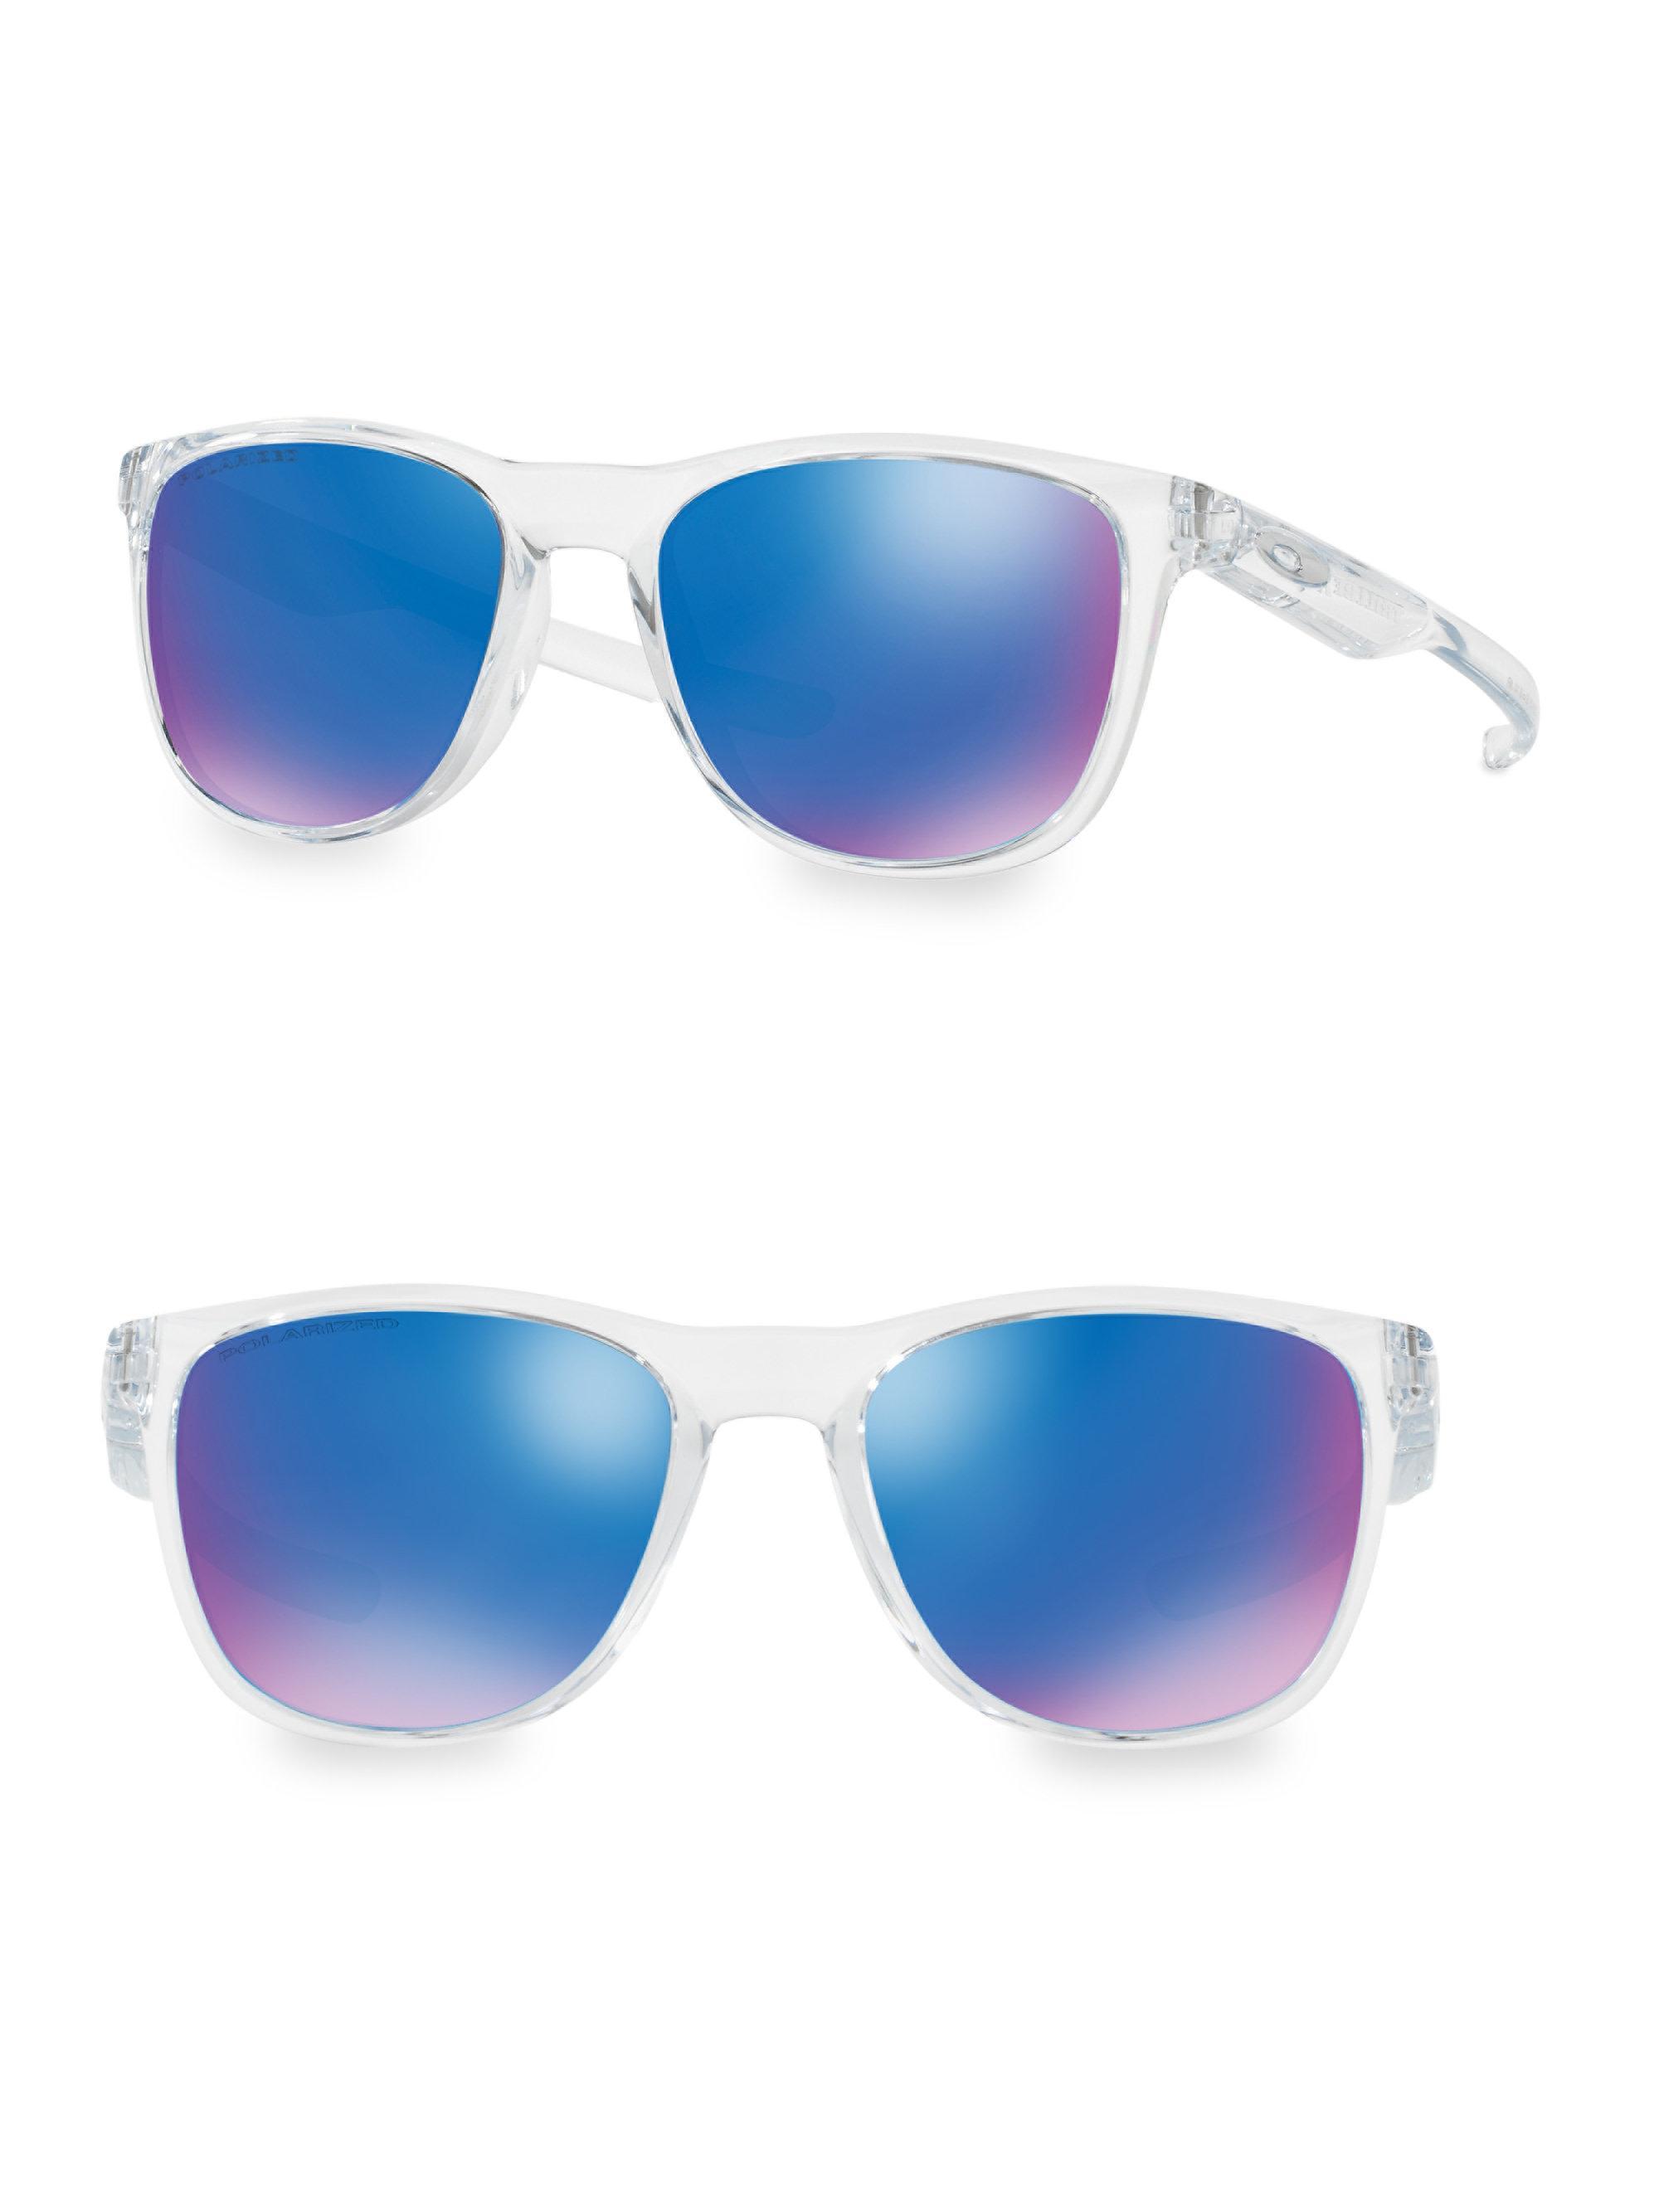 1e32abe978 Oakley Trillbetm X Polarized Round Sunglasses in Blue - Lyst